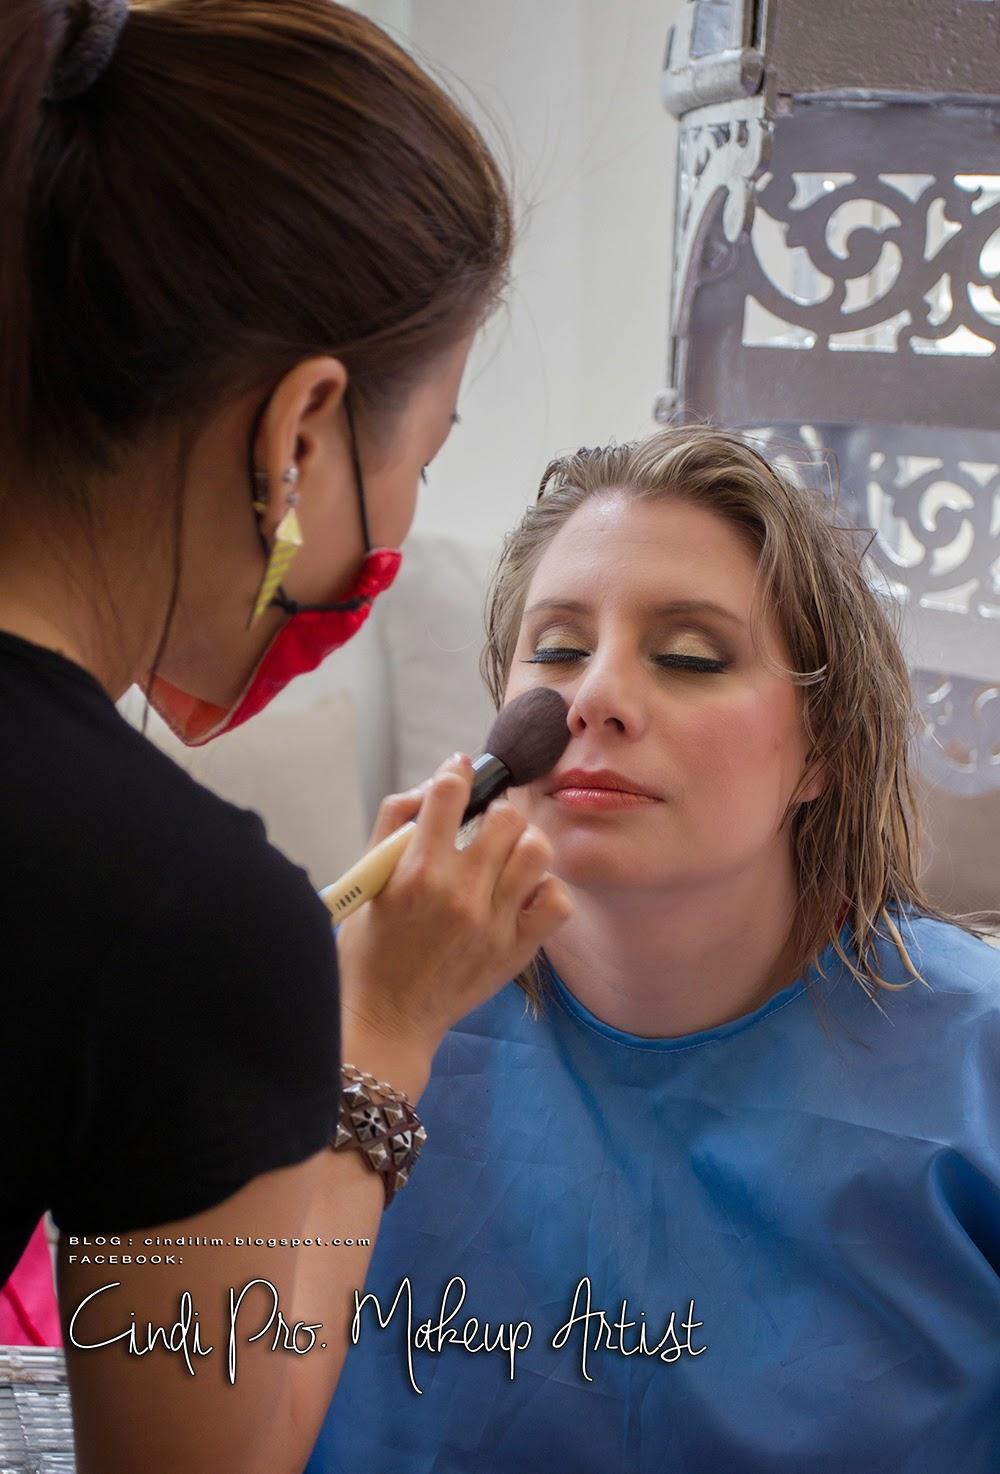 Cindi Pro Makeup Artist Commercial Photoshoot Makeup: :: Cindi Pro. Makeup Artist ::: September 2014